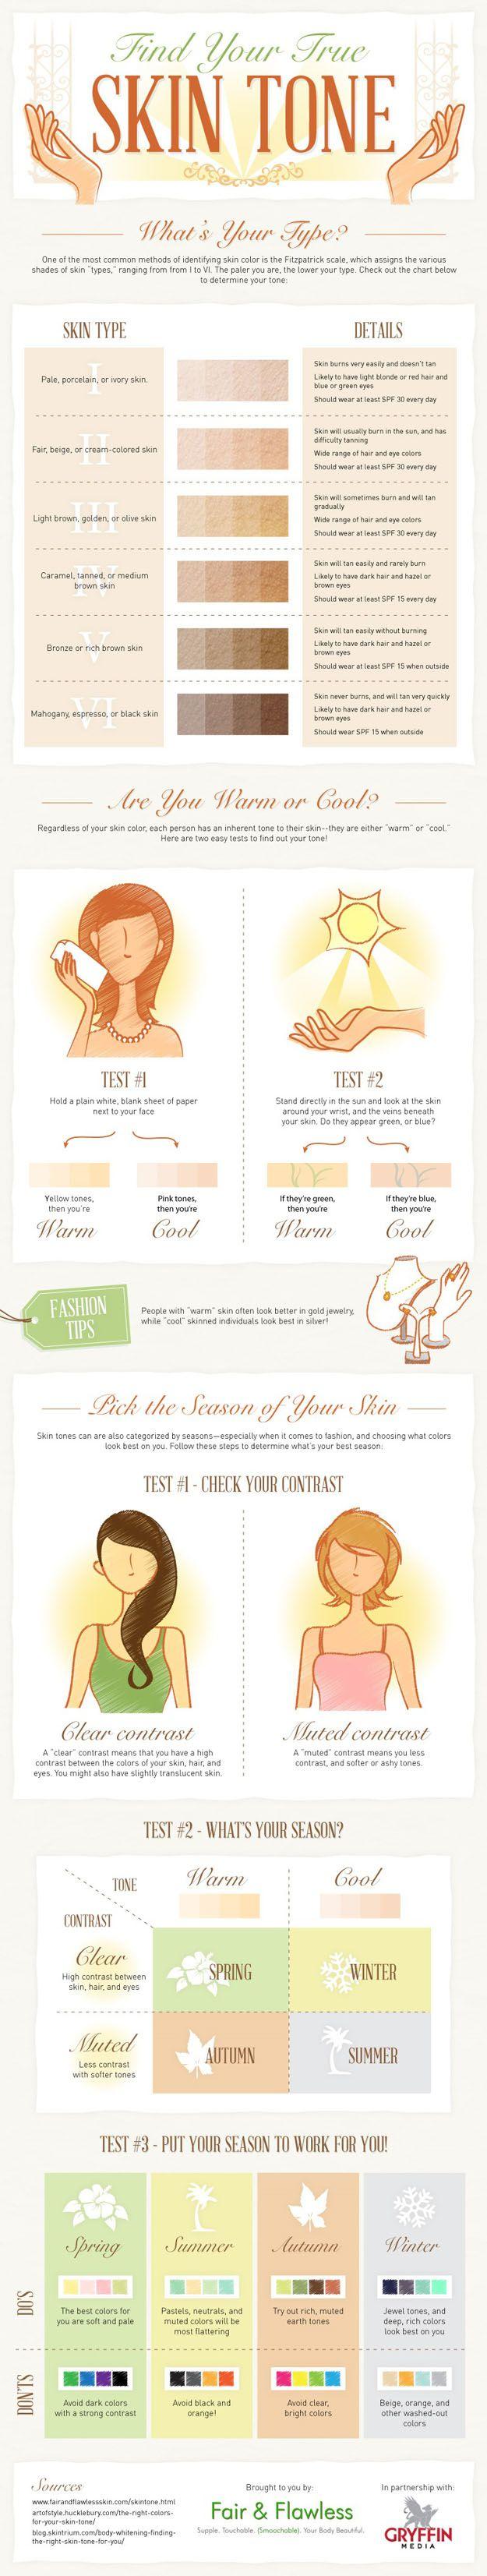 Makeup Tips and Tricks | Best Makeup Tutorials by Makeup Tutorials at http://makeuptutorials.com/makeup-tutorials-beauty-tips